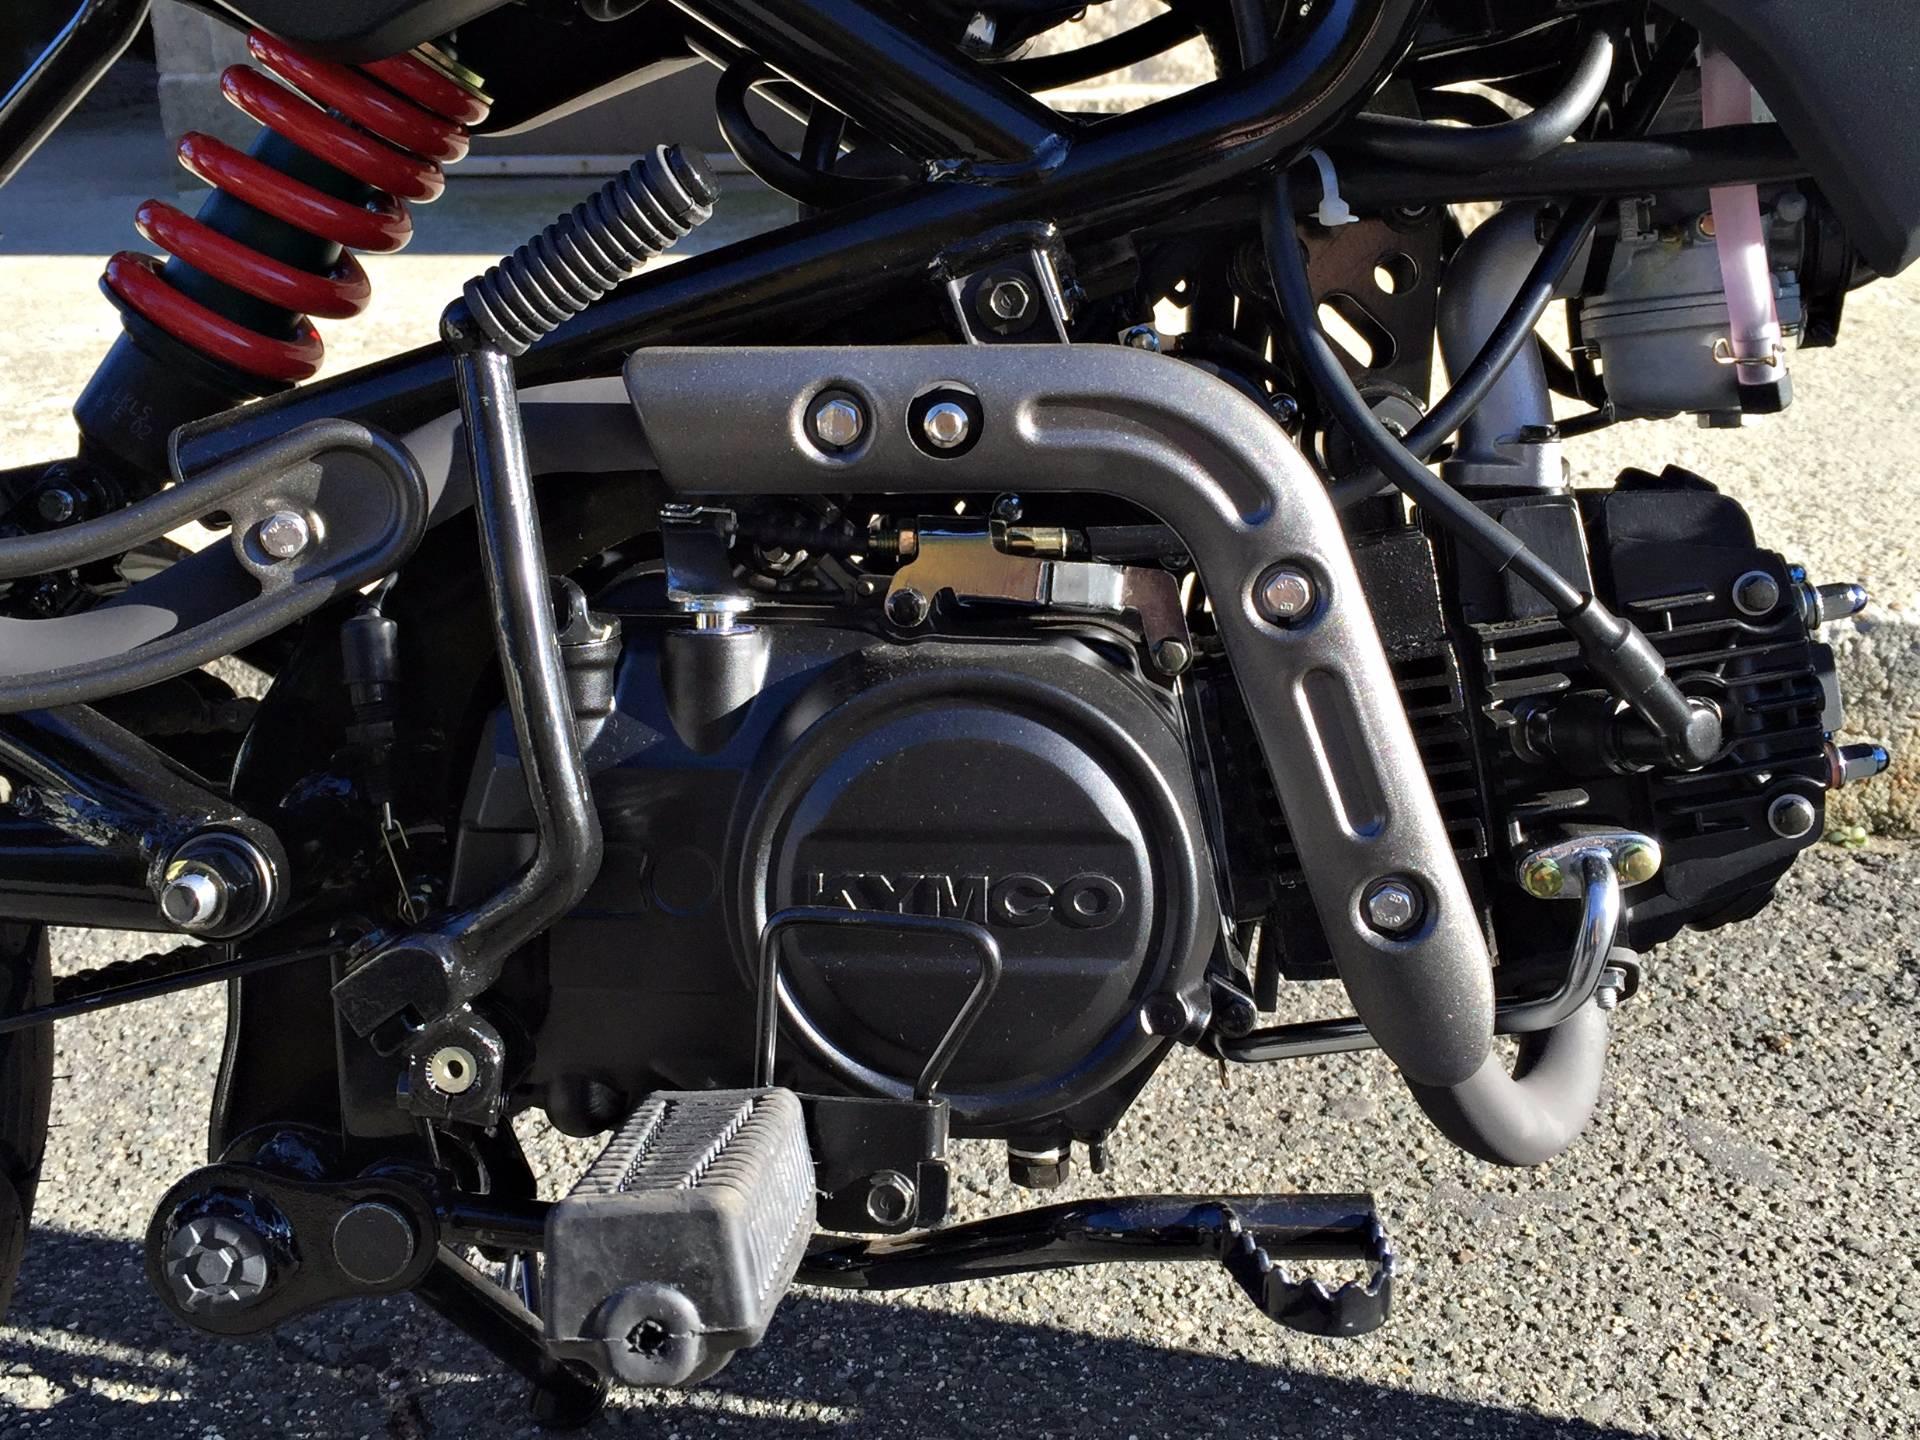 new 2017 kymco k-pipe 125 in black motorcycles in enfield, ct